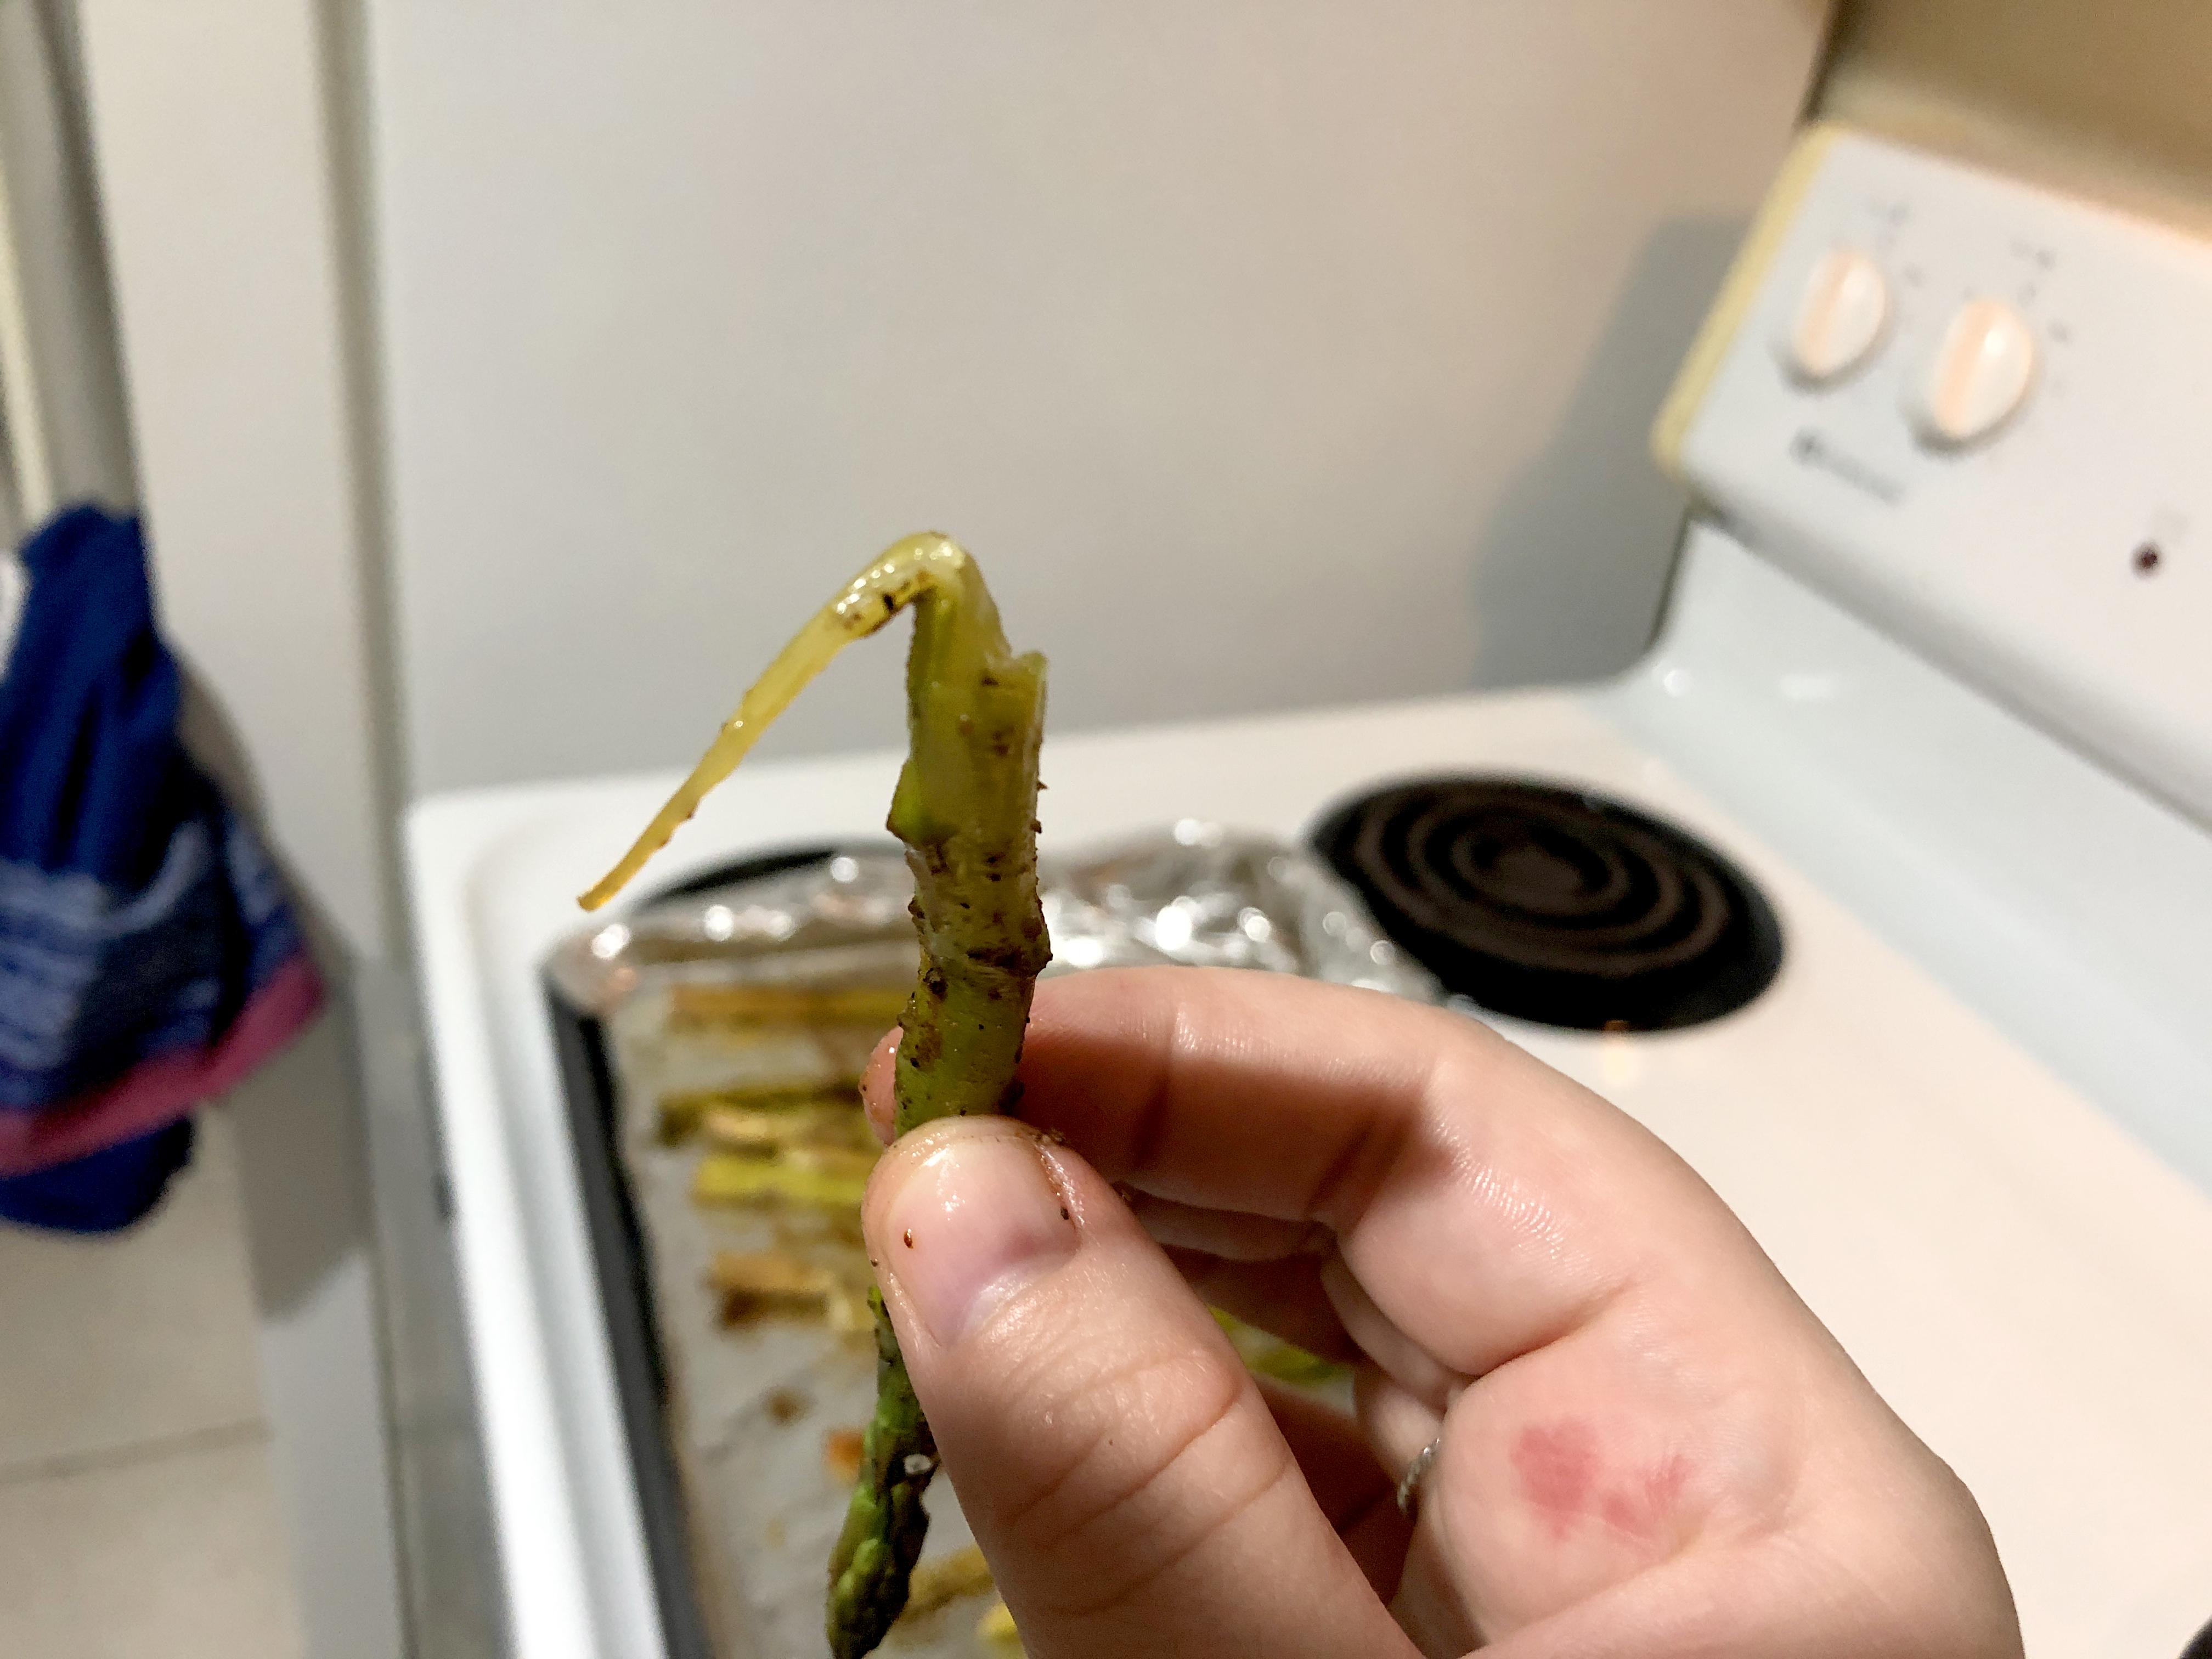 unpeeled asparagus